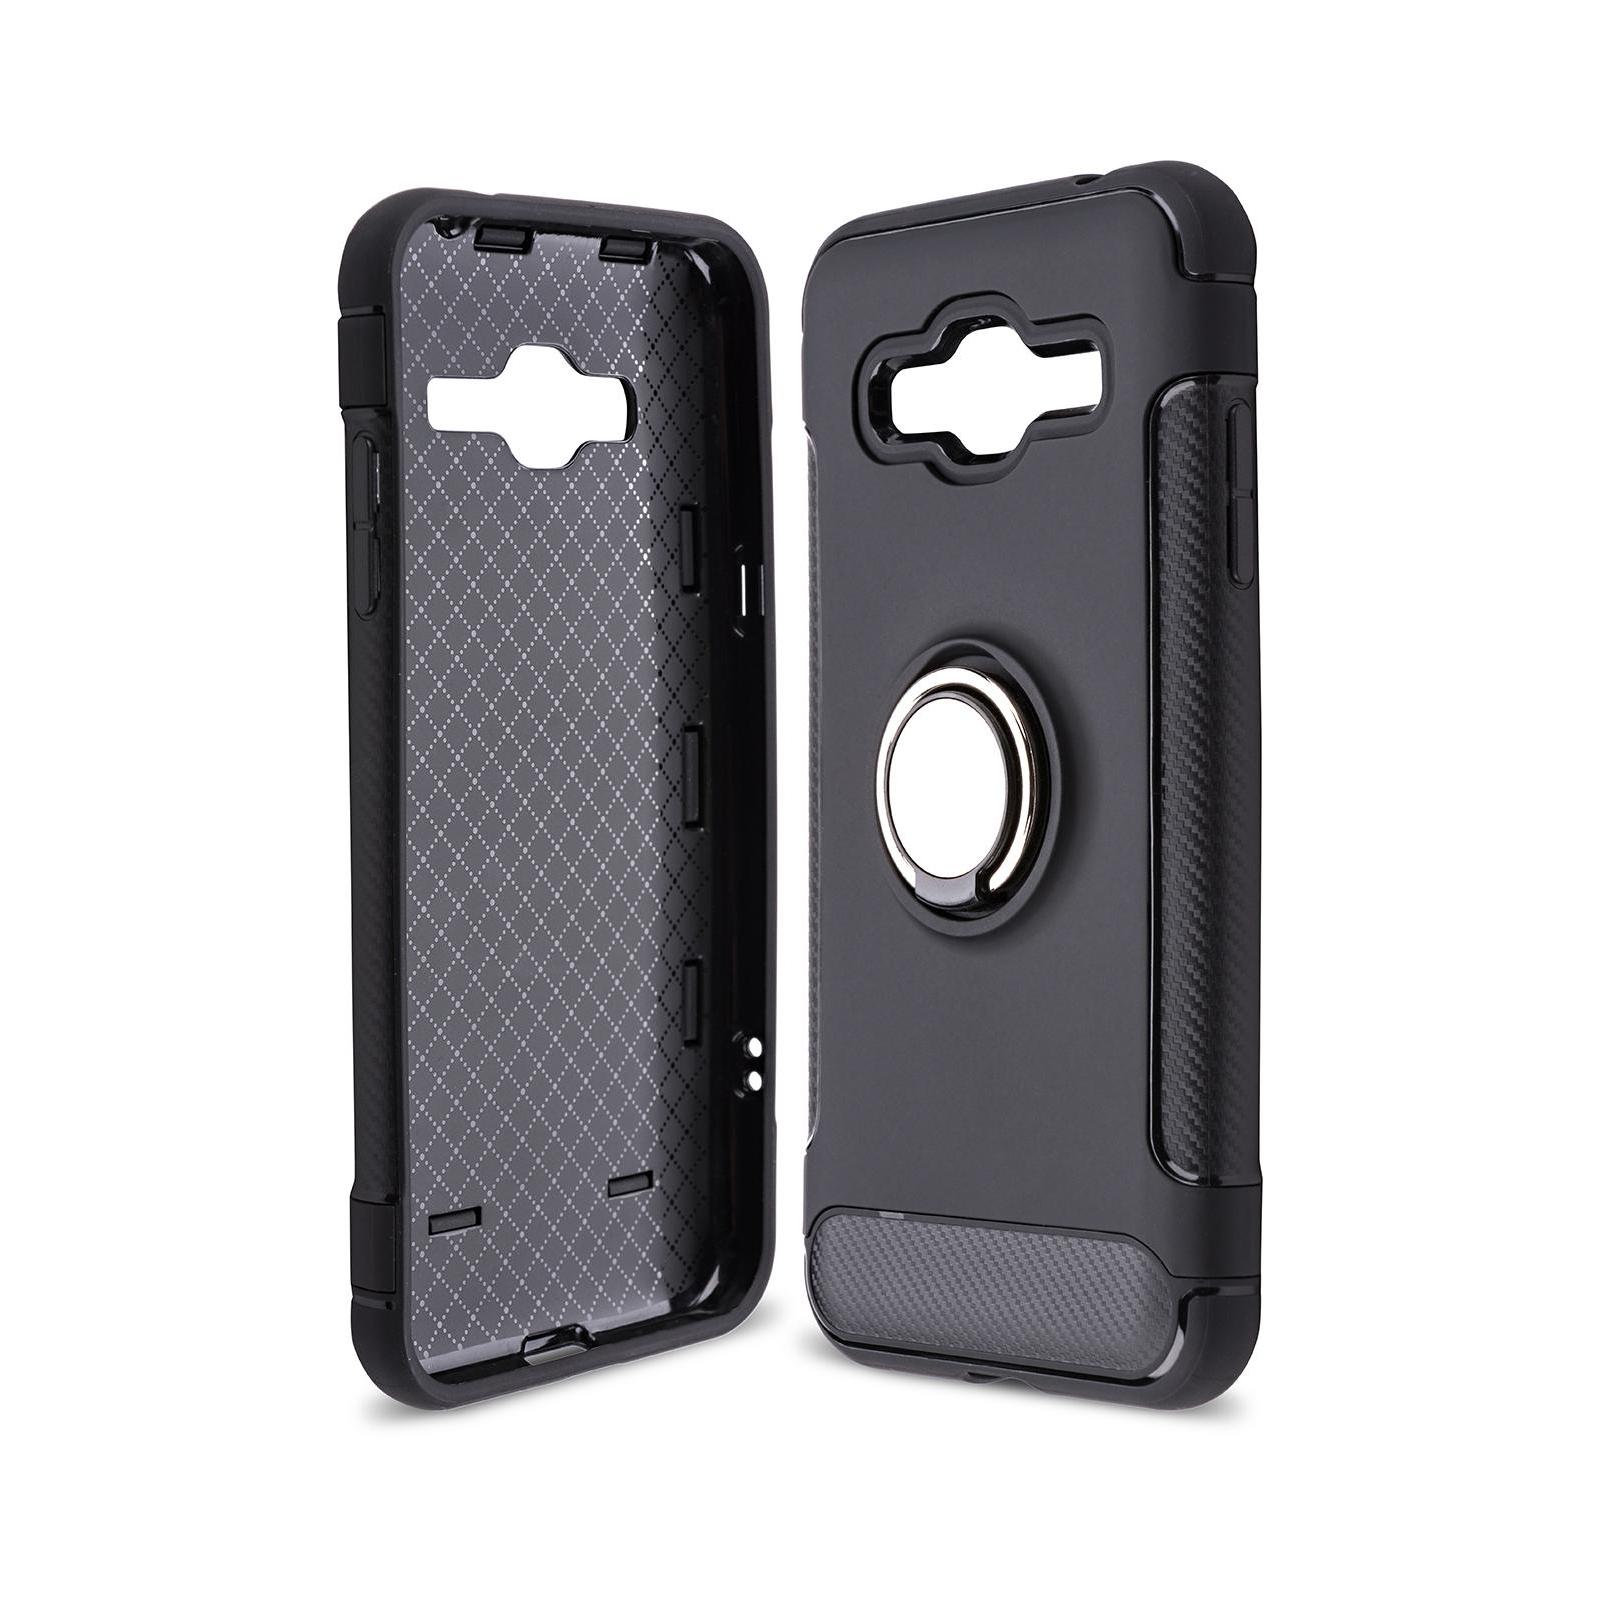 Чехол для моб. телефона Laudtec для Samsung J3 2016/J320 Ring stand (black) (LR-J320-BC)